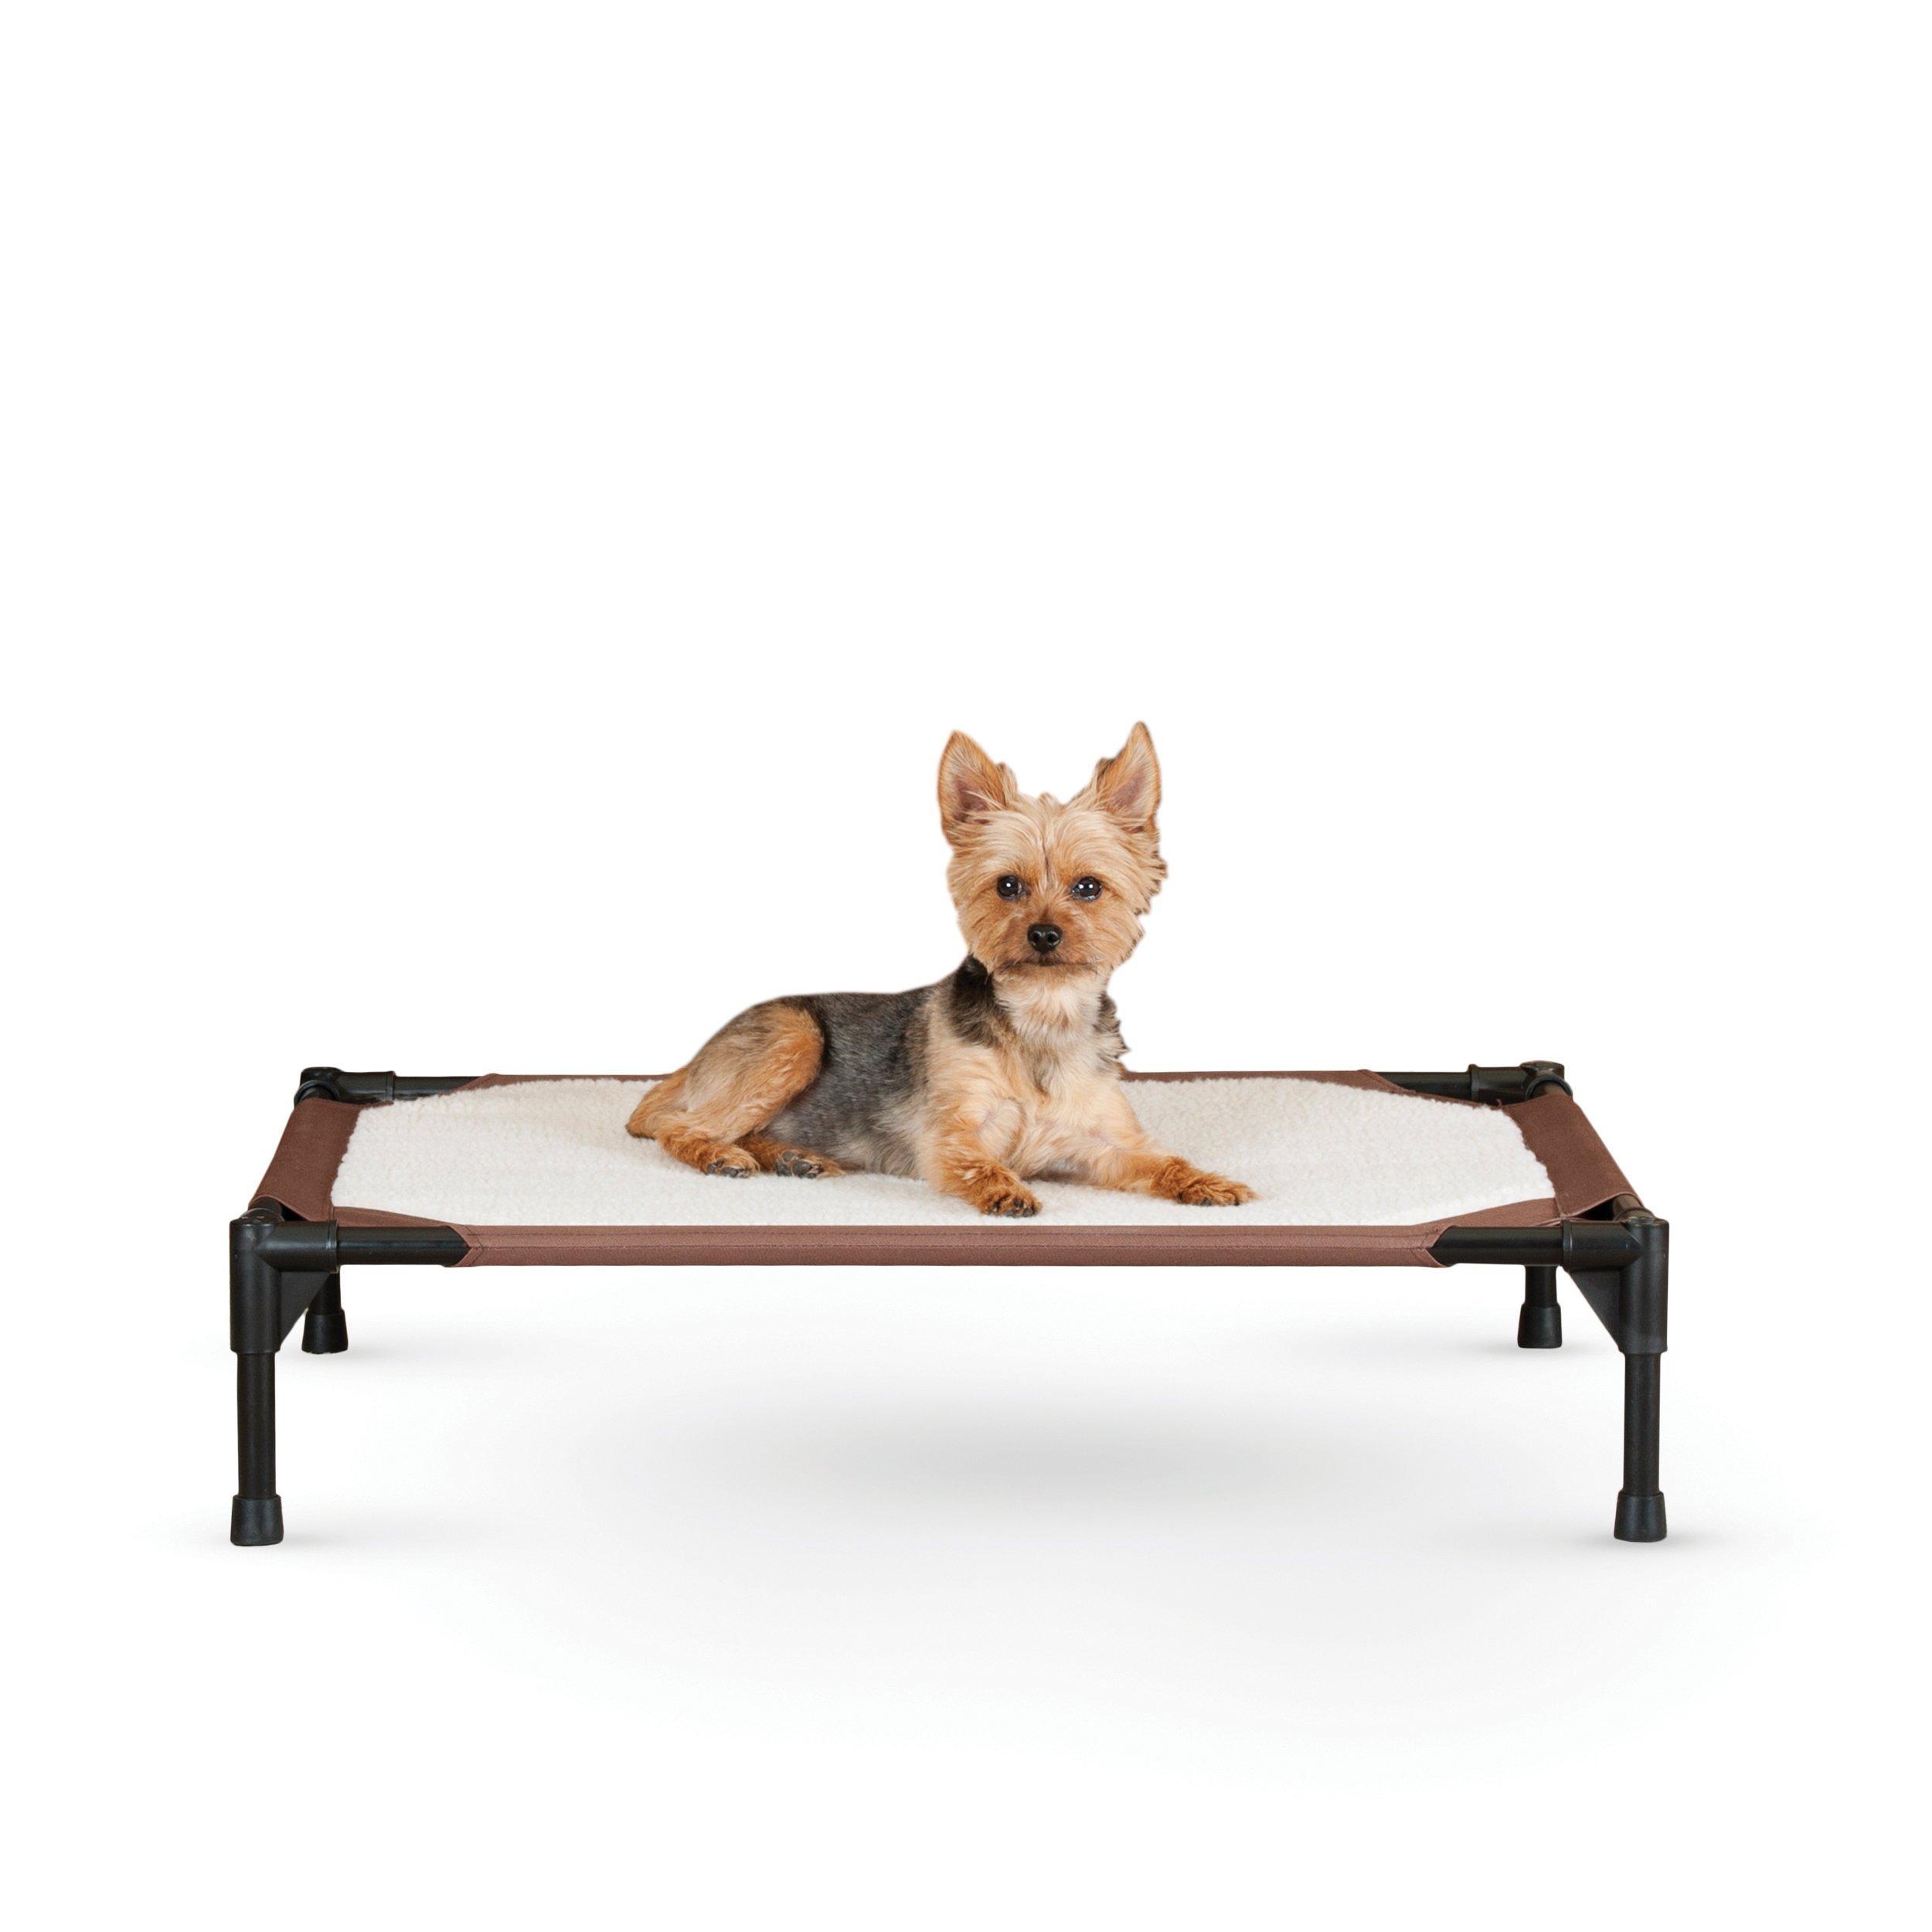 K&H Pet Products Self-Warming Pet Cot Elevated Pet Bed Medium Chocolate/Fleece 25'' x 32'' x 7''